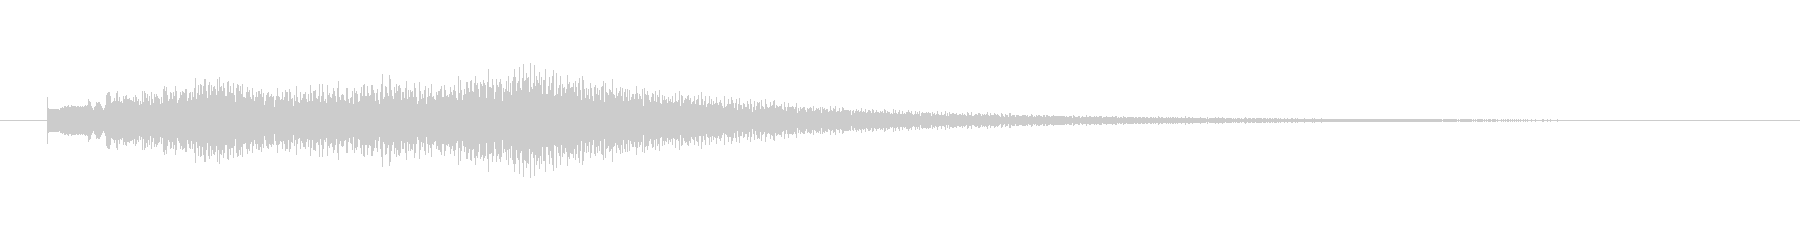 トゥルリントゥルリントゥルリンの未再生の波形